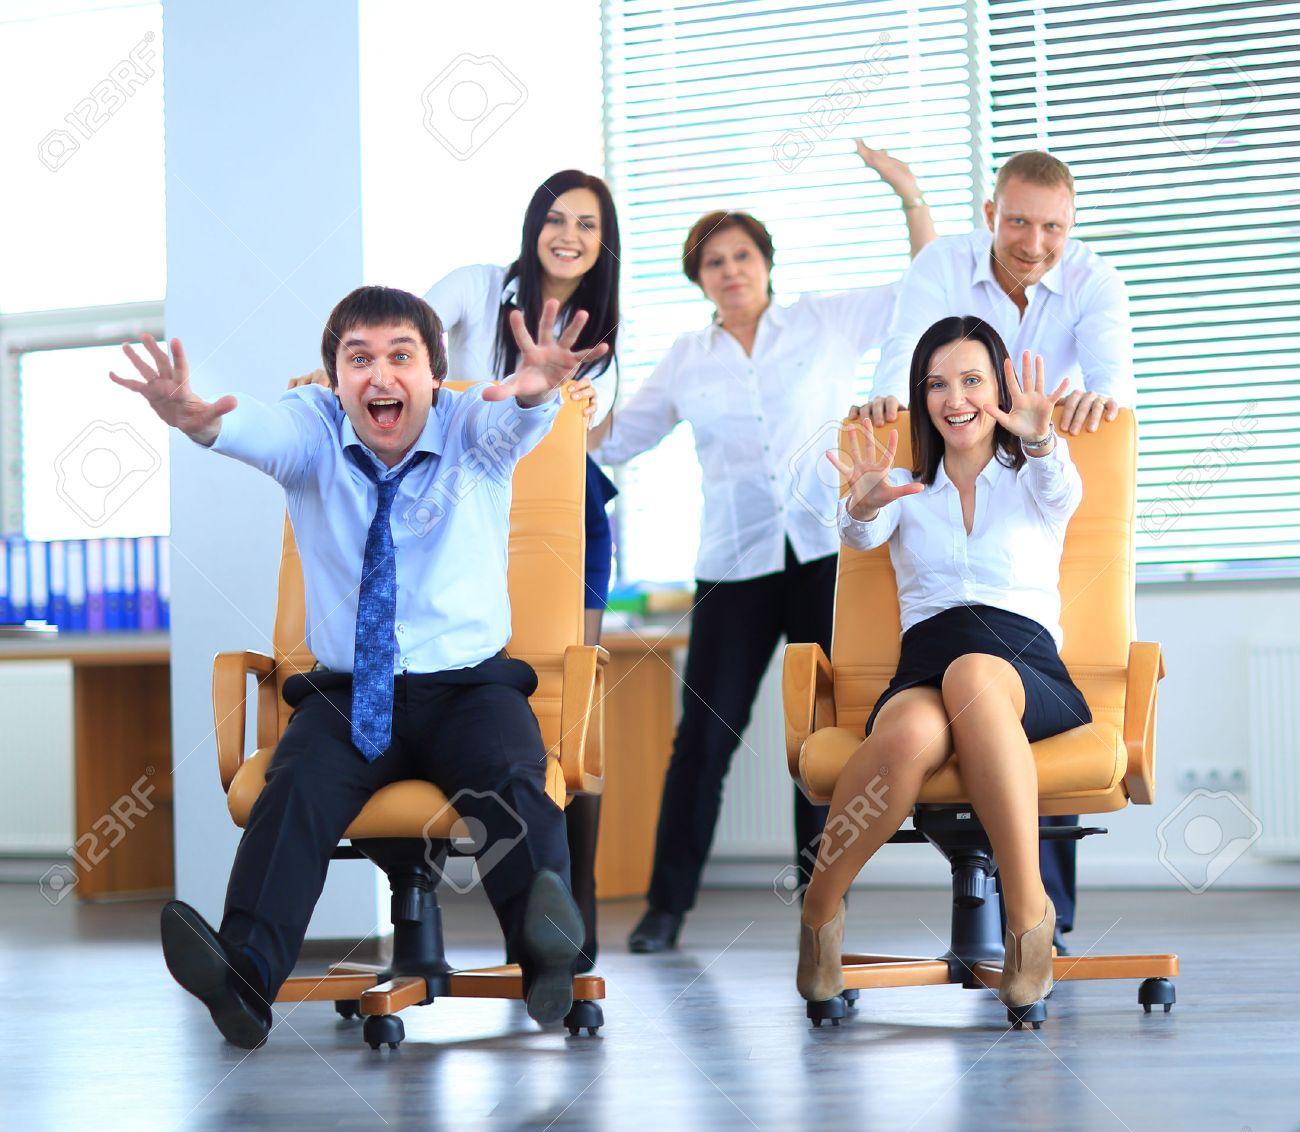 Happy office employees having fun at work in an office chair race Standard-Bild - 29170065